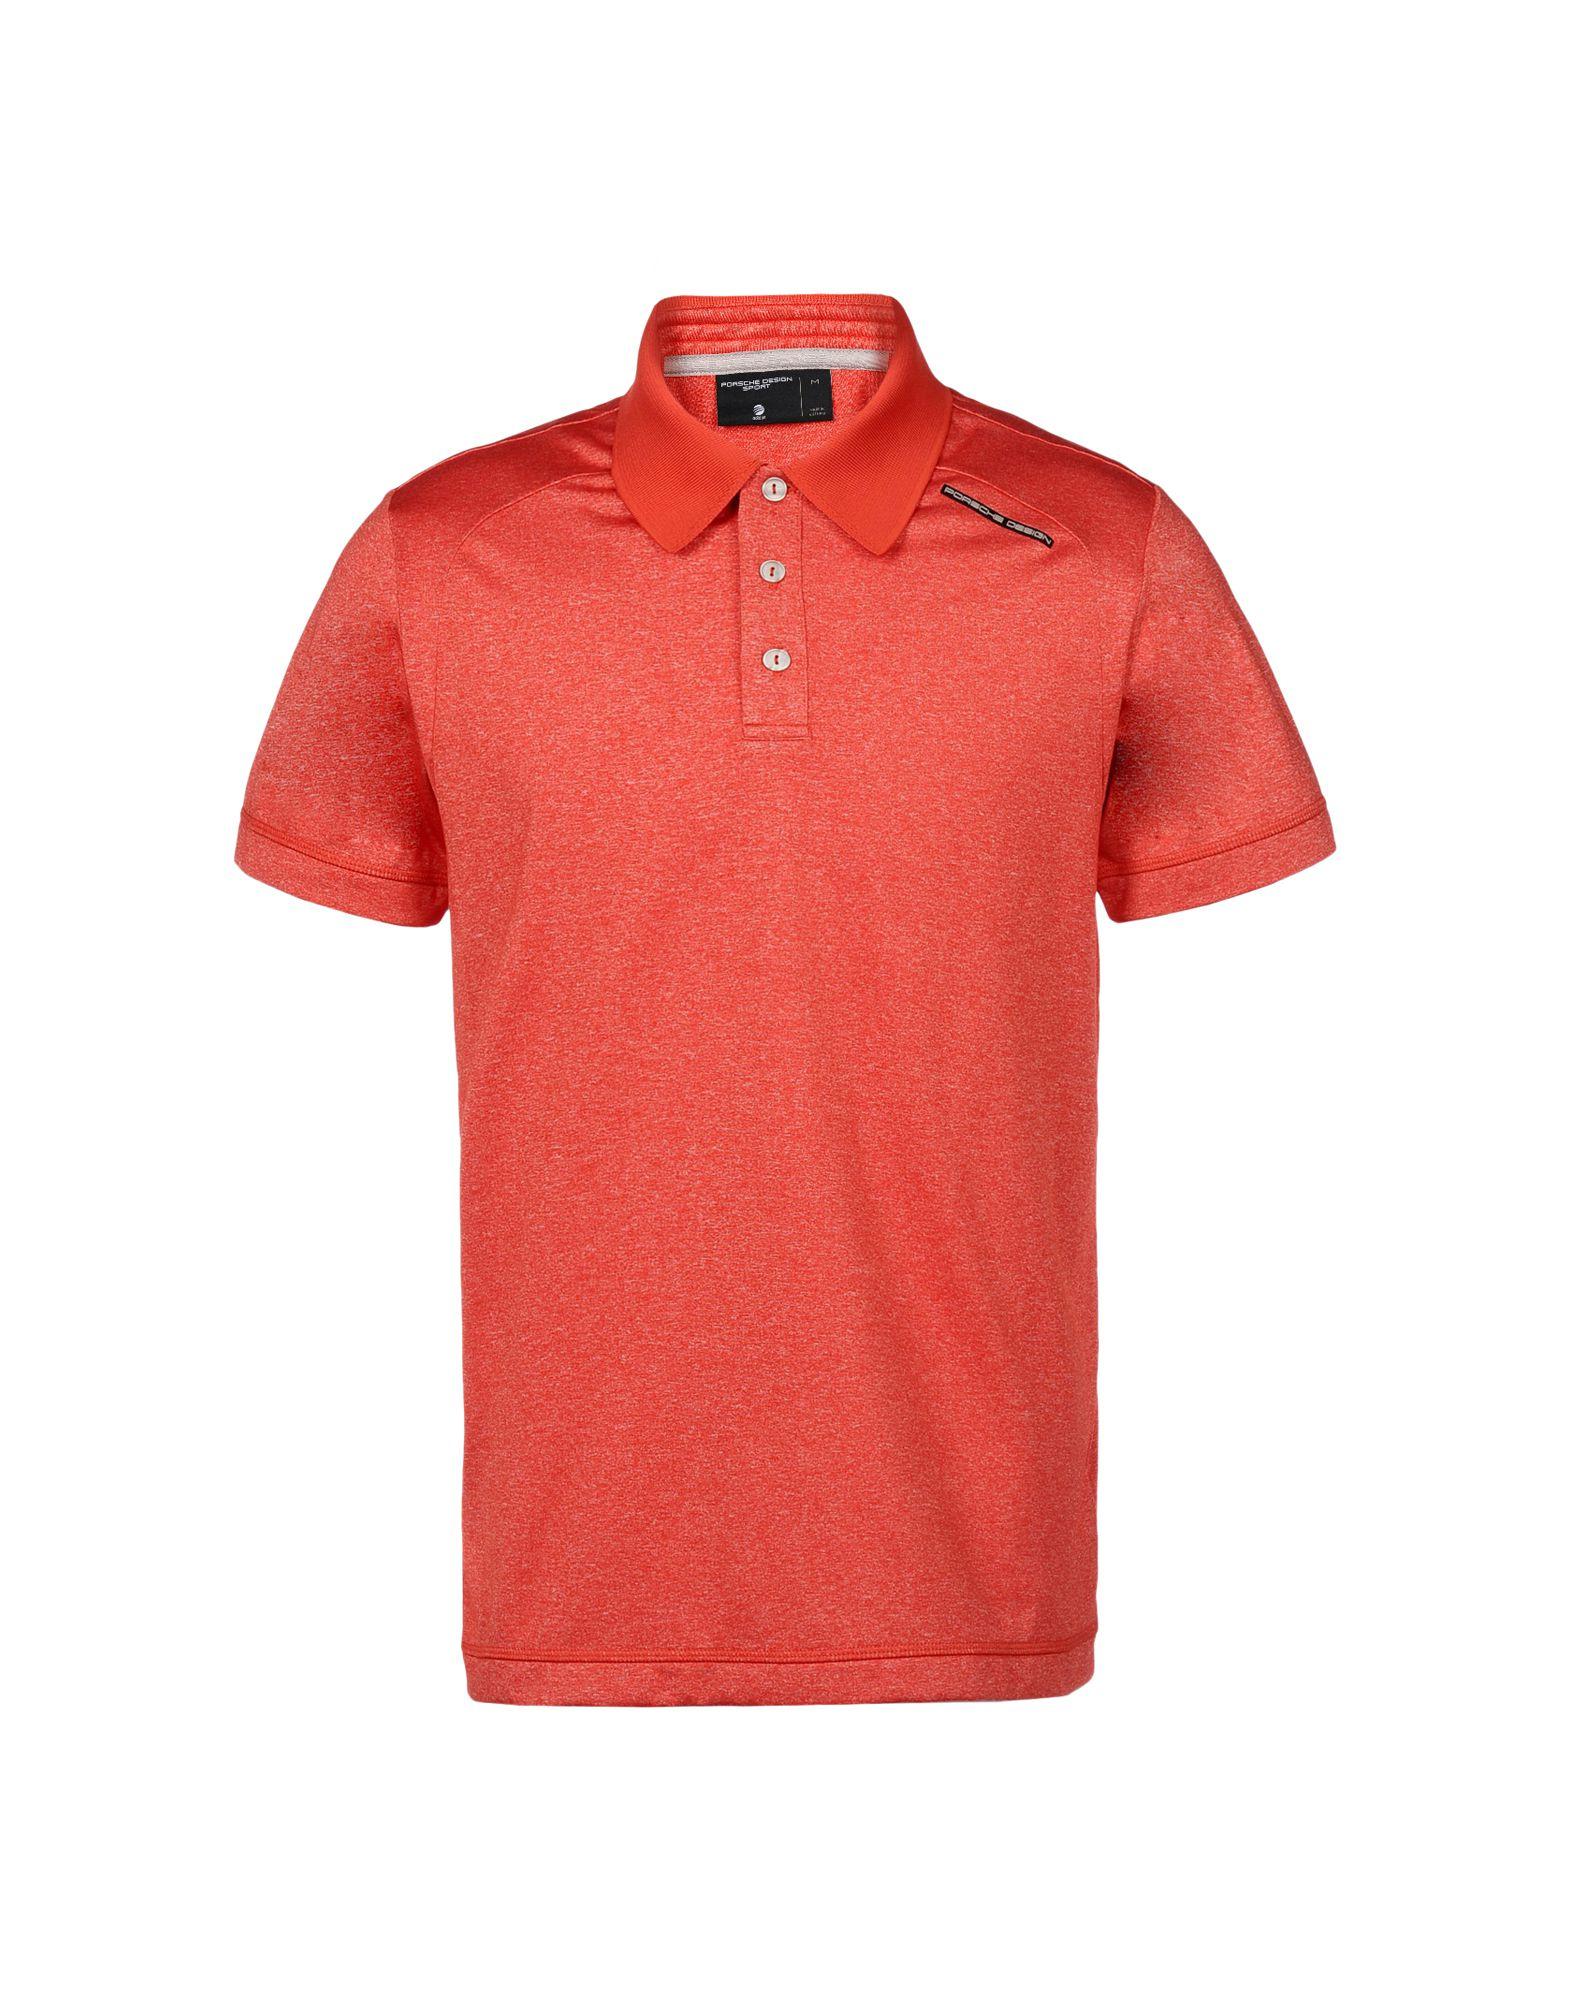 lyst porsche design polo shirt in red for men. Black Bedroom Furniture Sets. Home Design Ideas